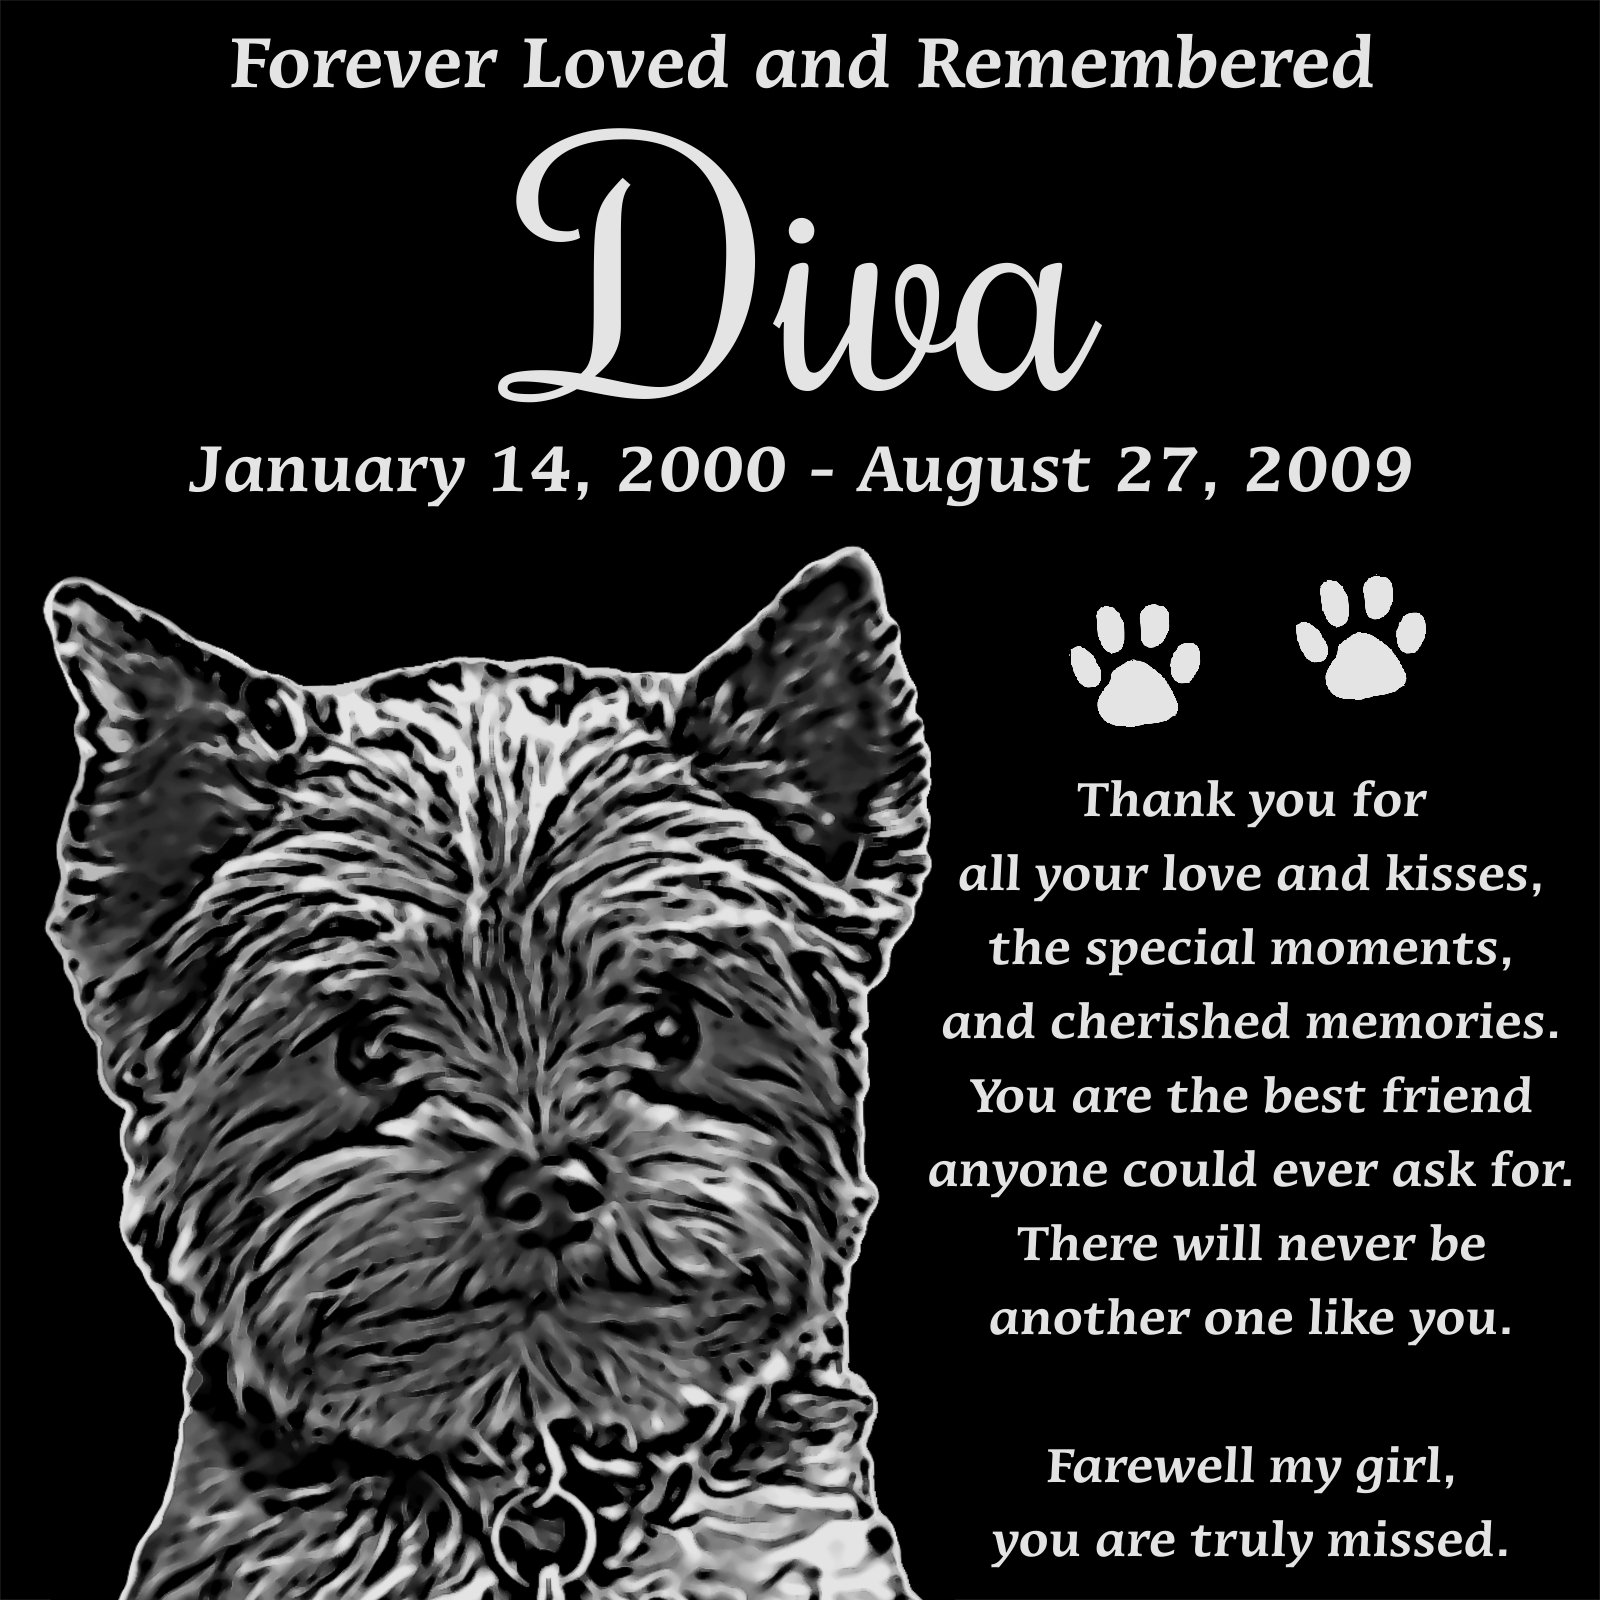 Personalized Yorkshire Terrier Pet Memorial 12''x12'' Engraved Black Granite Grave Marker Head Stone Plaque DIV1